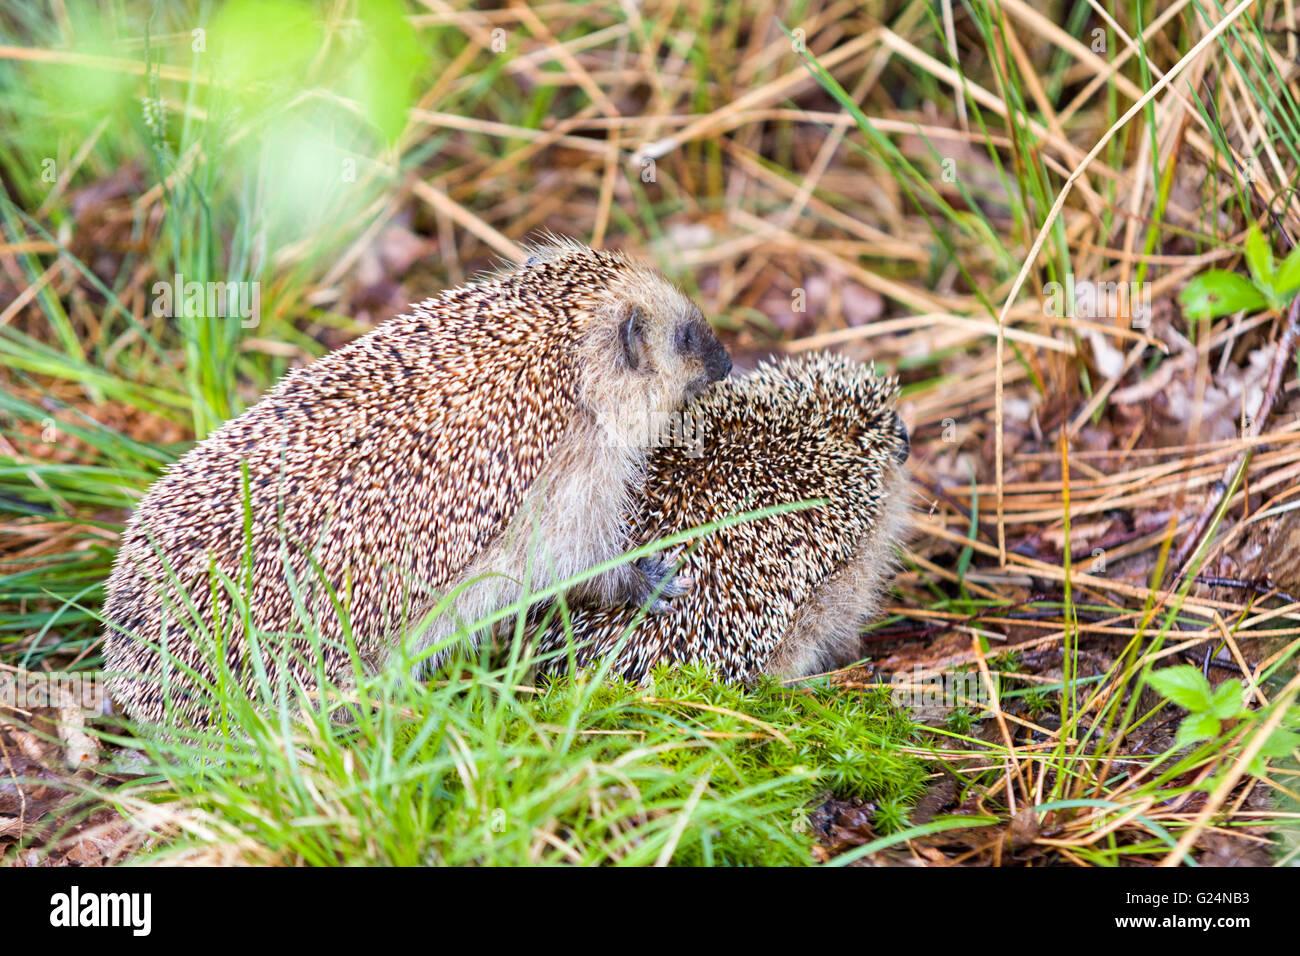 European hedgehogs (Erinaceus europaeus) mating  Model Release: No.  Property Release: No. - Stock Image